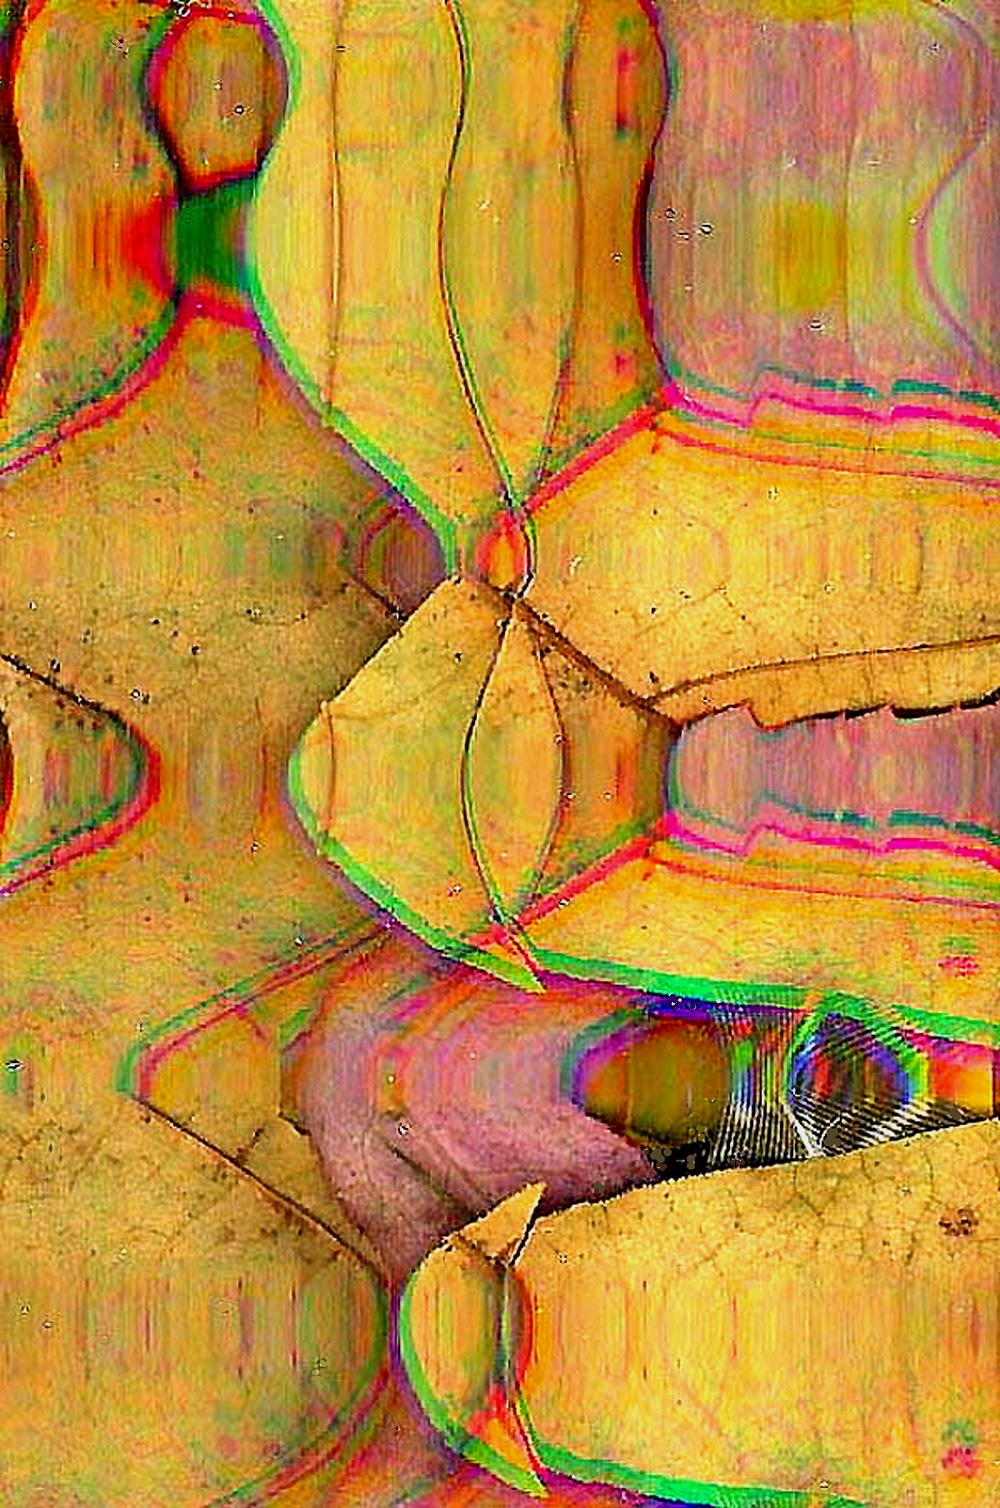 Mixed-Media Digital Image, Making Par Fleche, by Robert Bharda